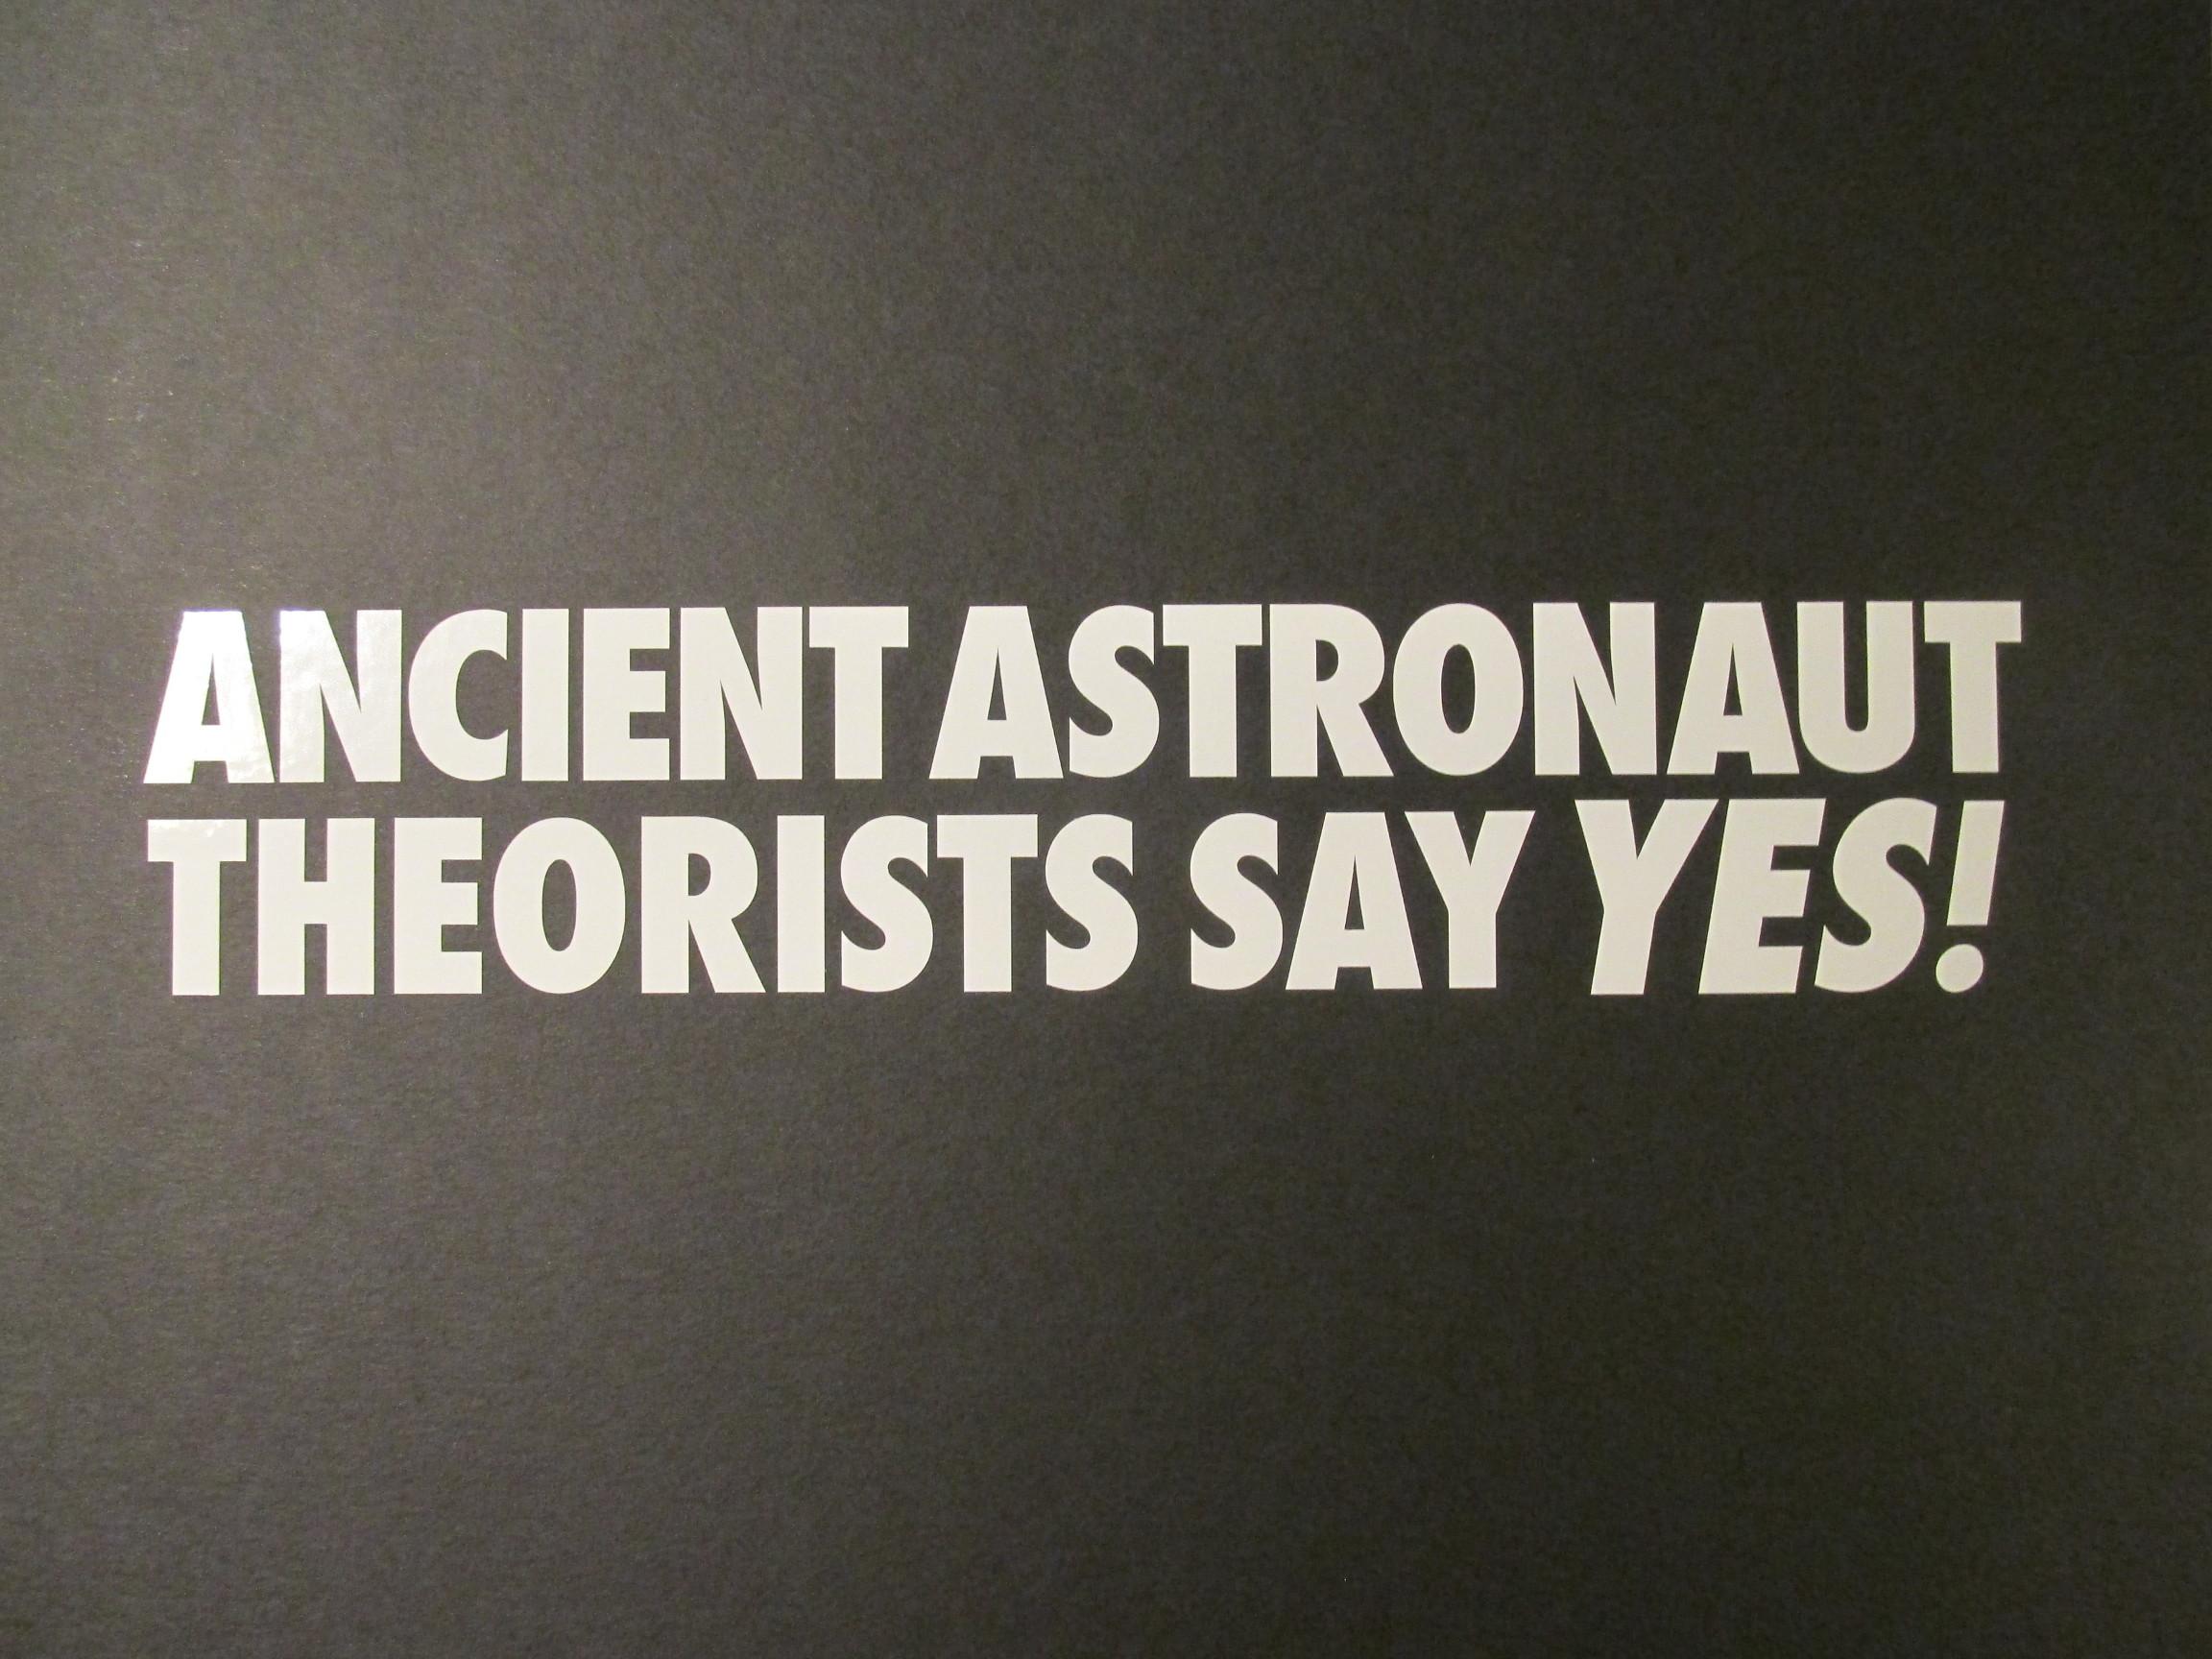 ancient astronaut theorists say yes   u2013 stonefly custom vinyl